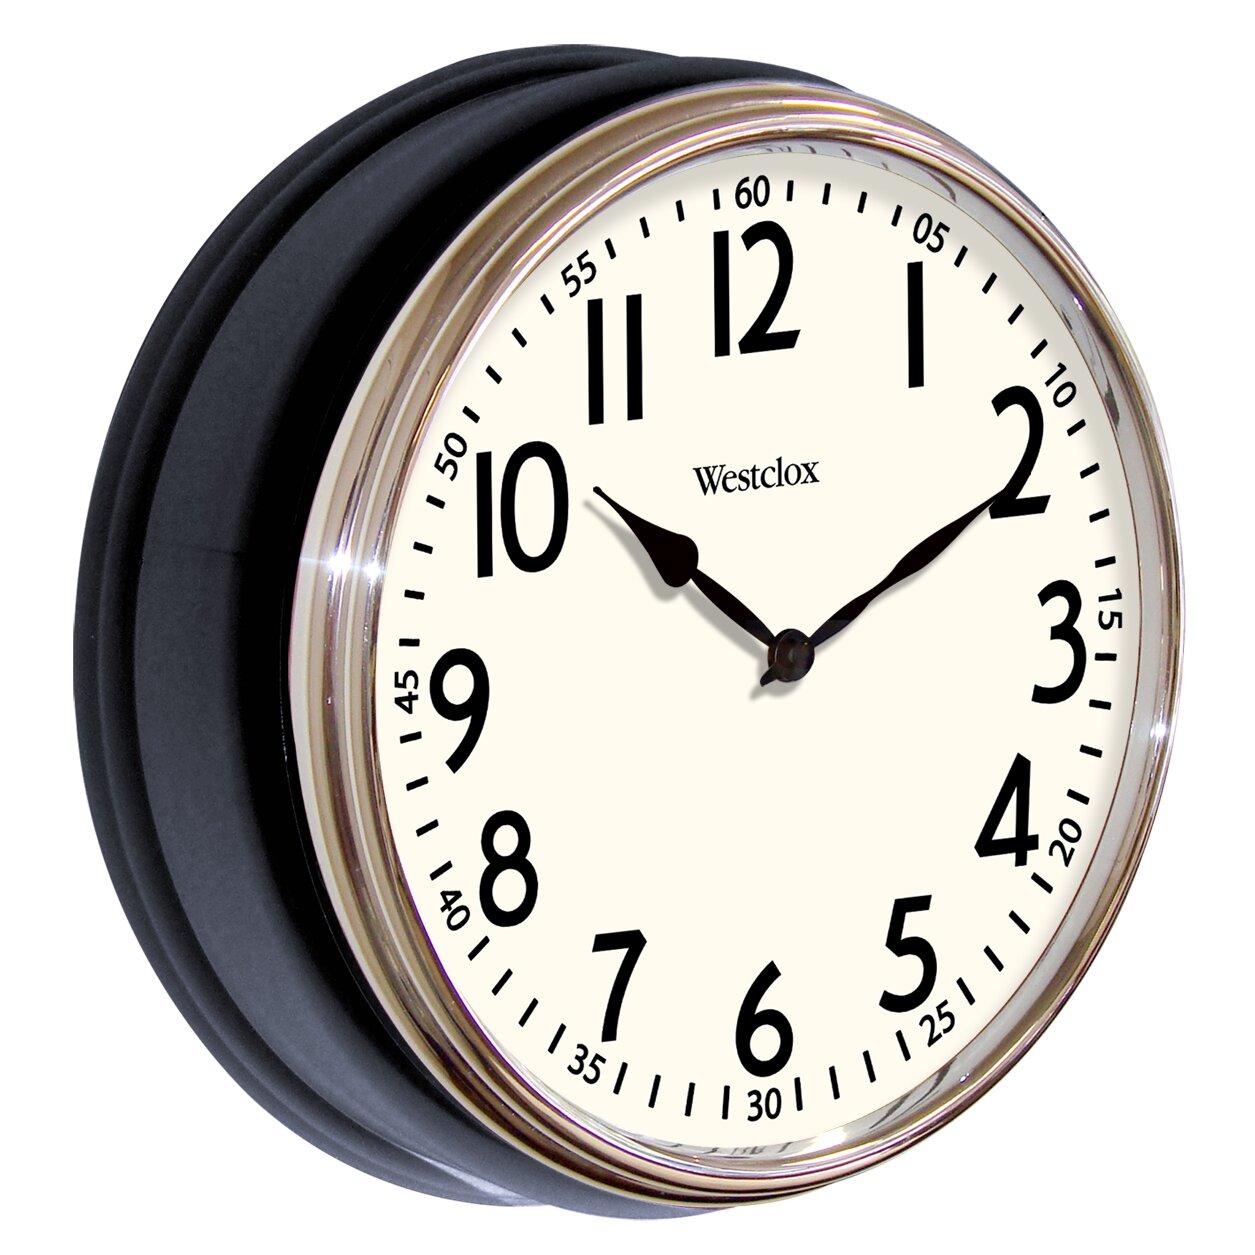 Retro Kitchen Wall Clocks Modern Contemporary Wall Clocks Youll Love Wayfair